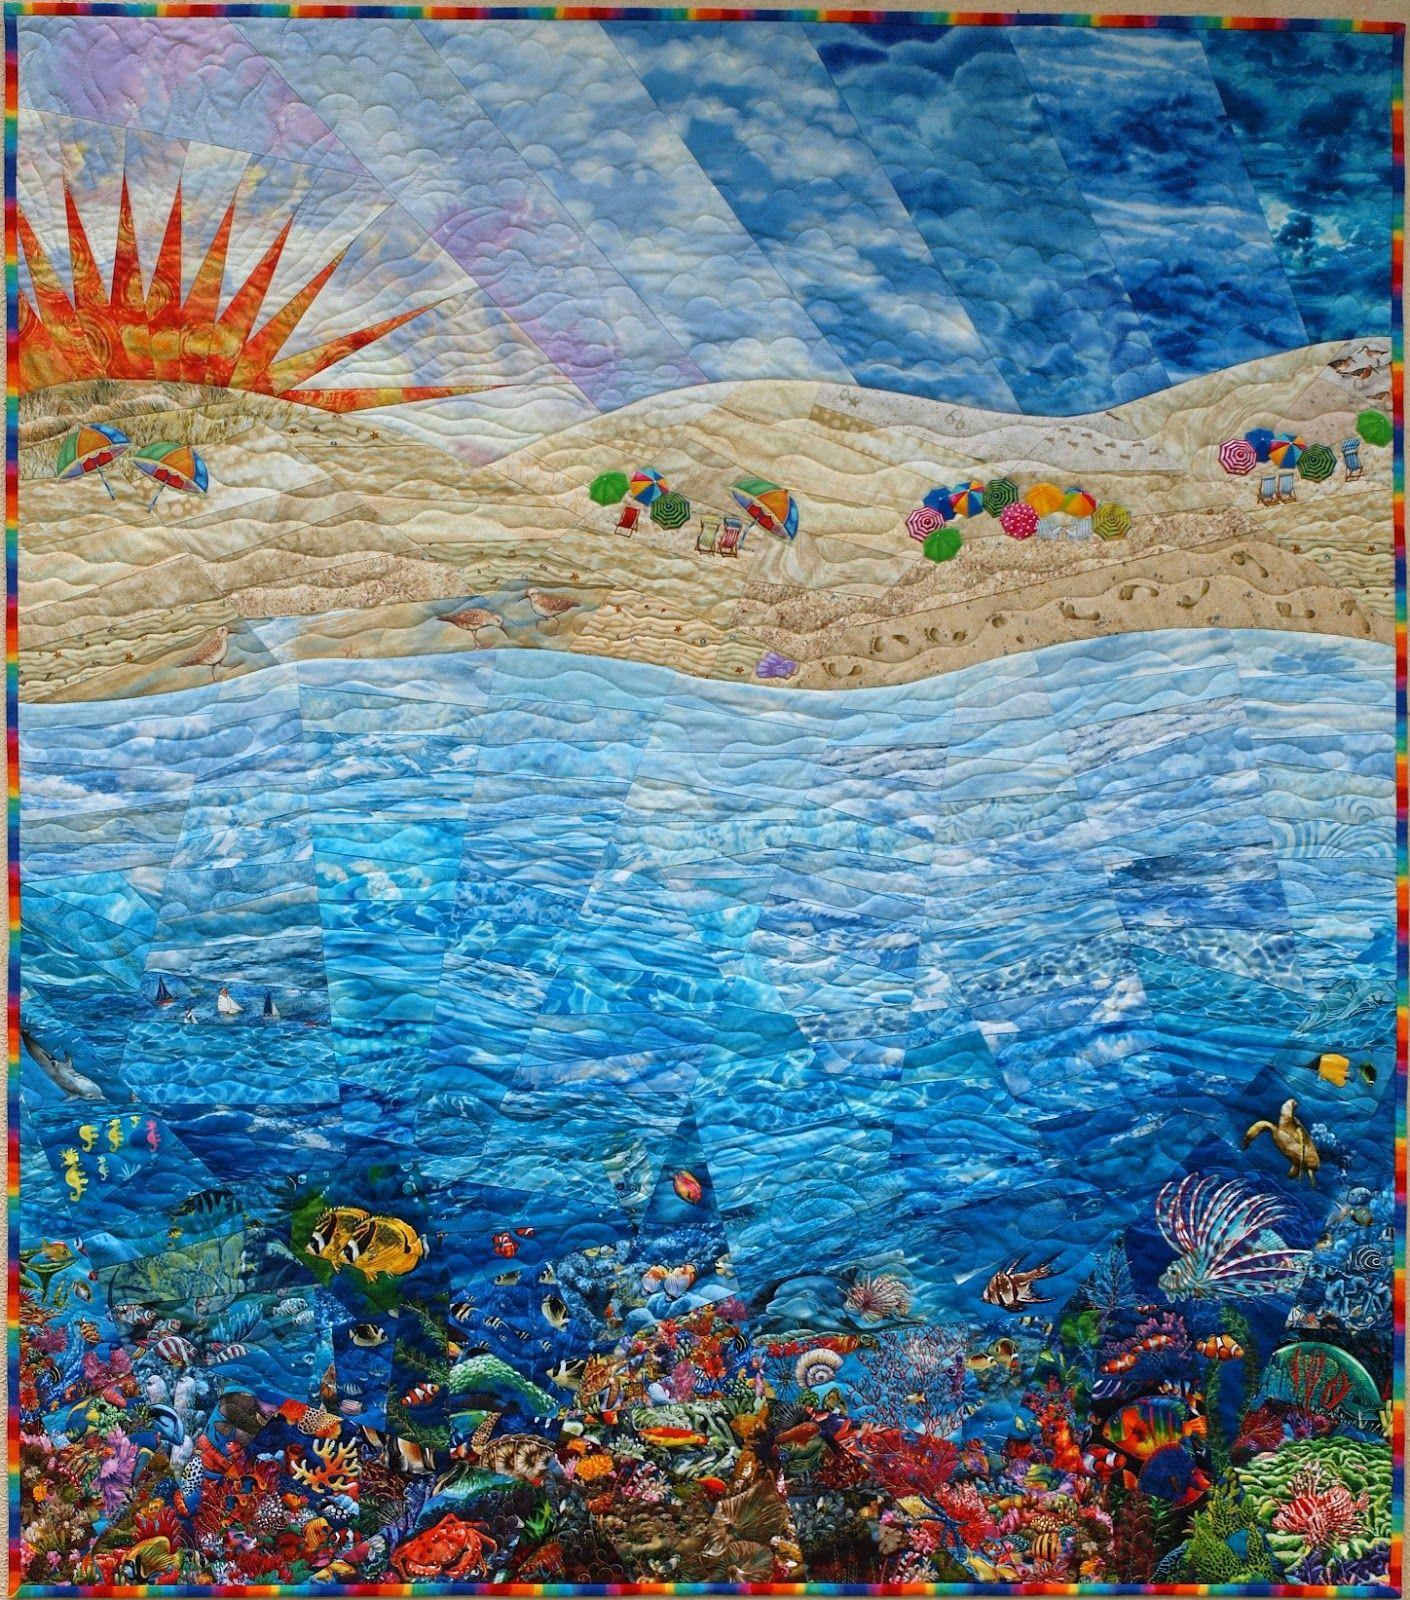 Sampaguita Quilts: 2012 at Sampaguita Quilts